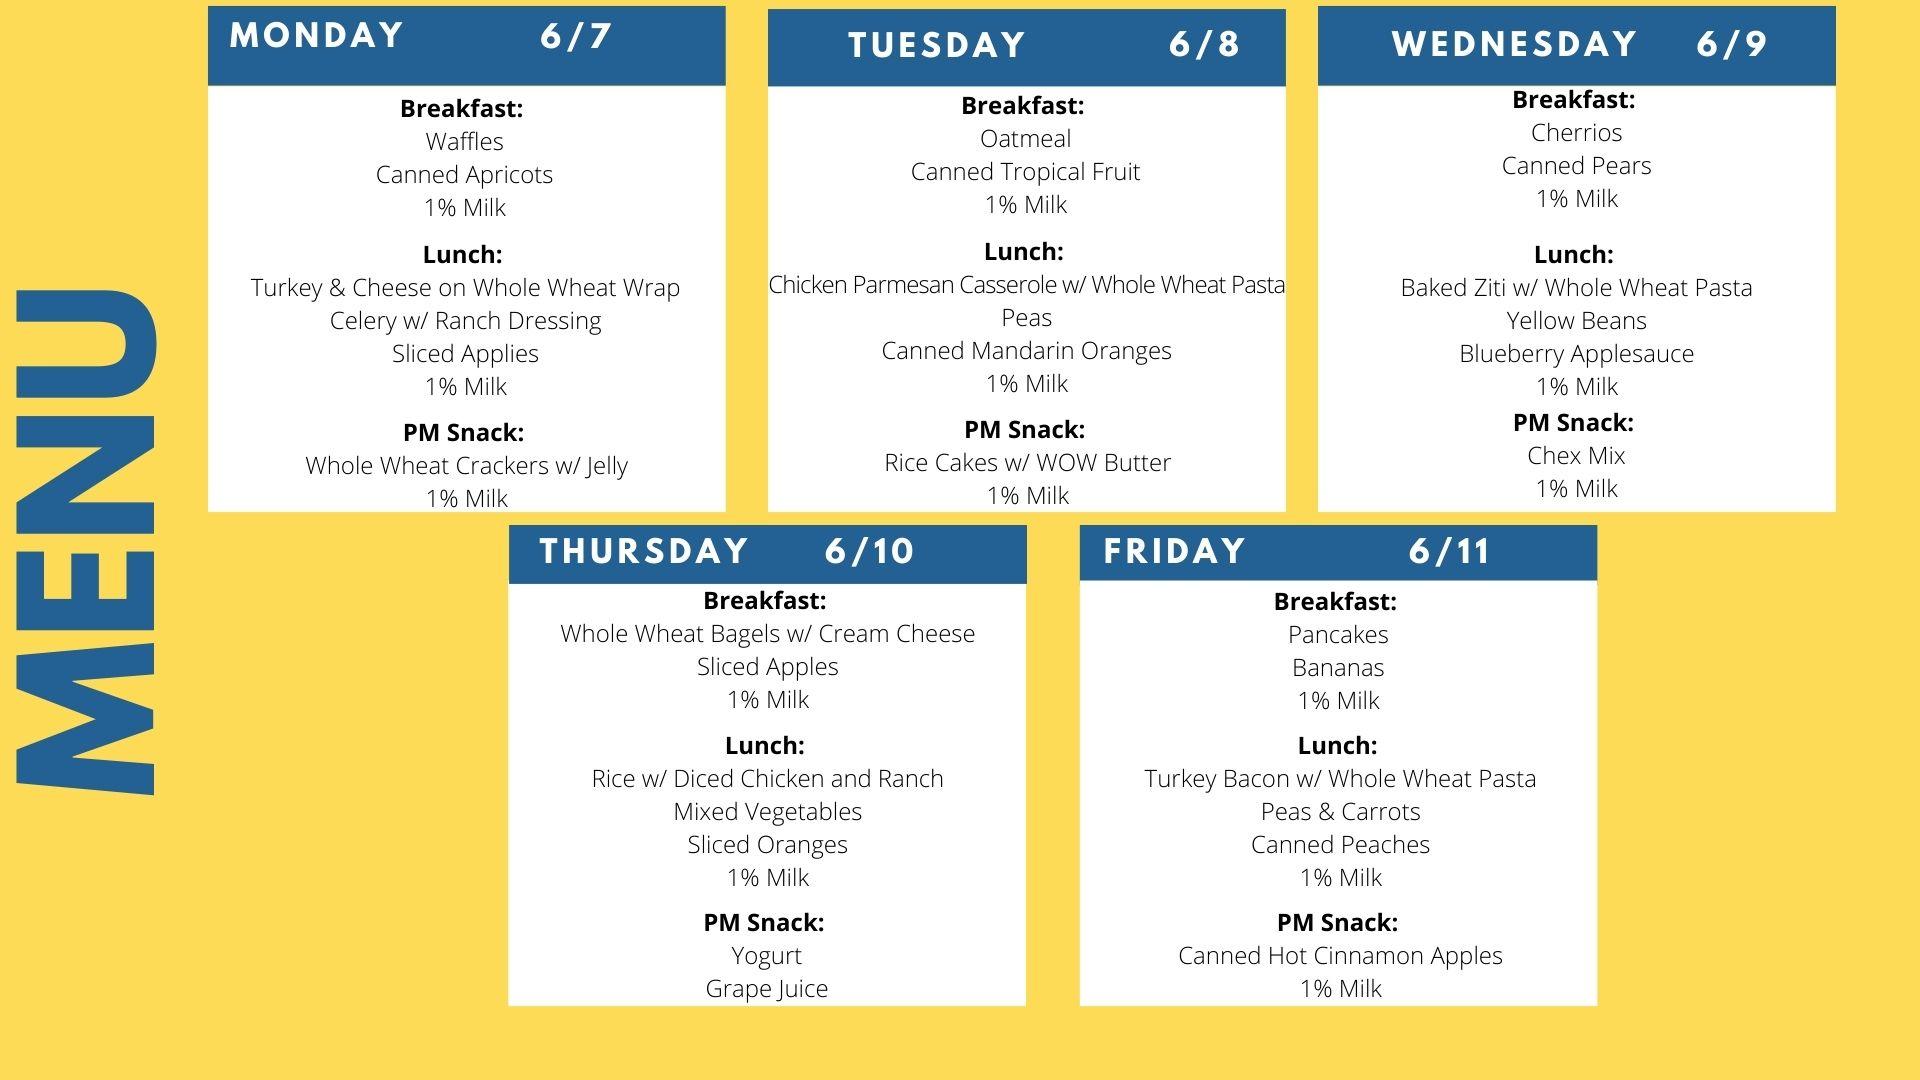 Lunch menu June 7 through 11